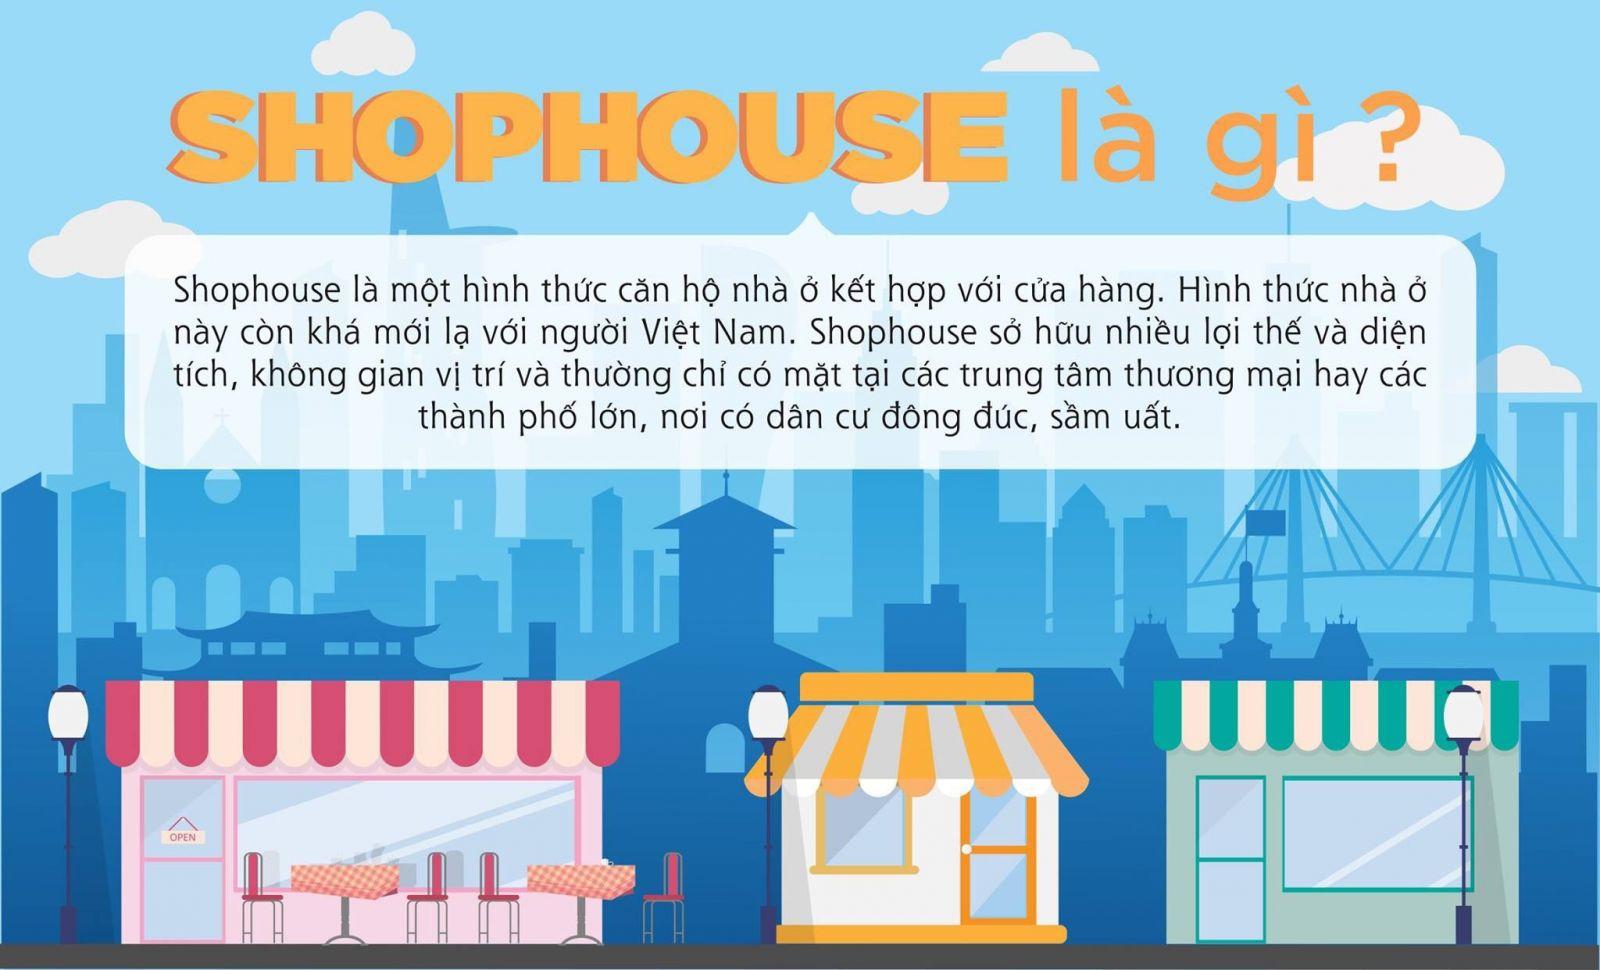 shophouse là gì, khái niệm shophouse